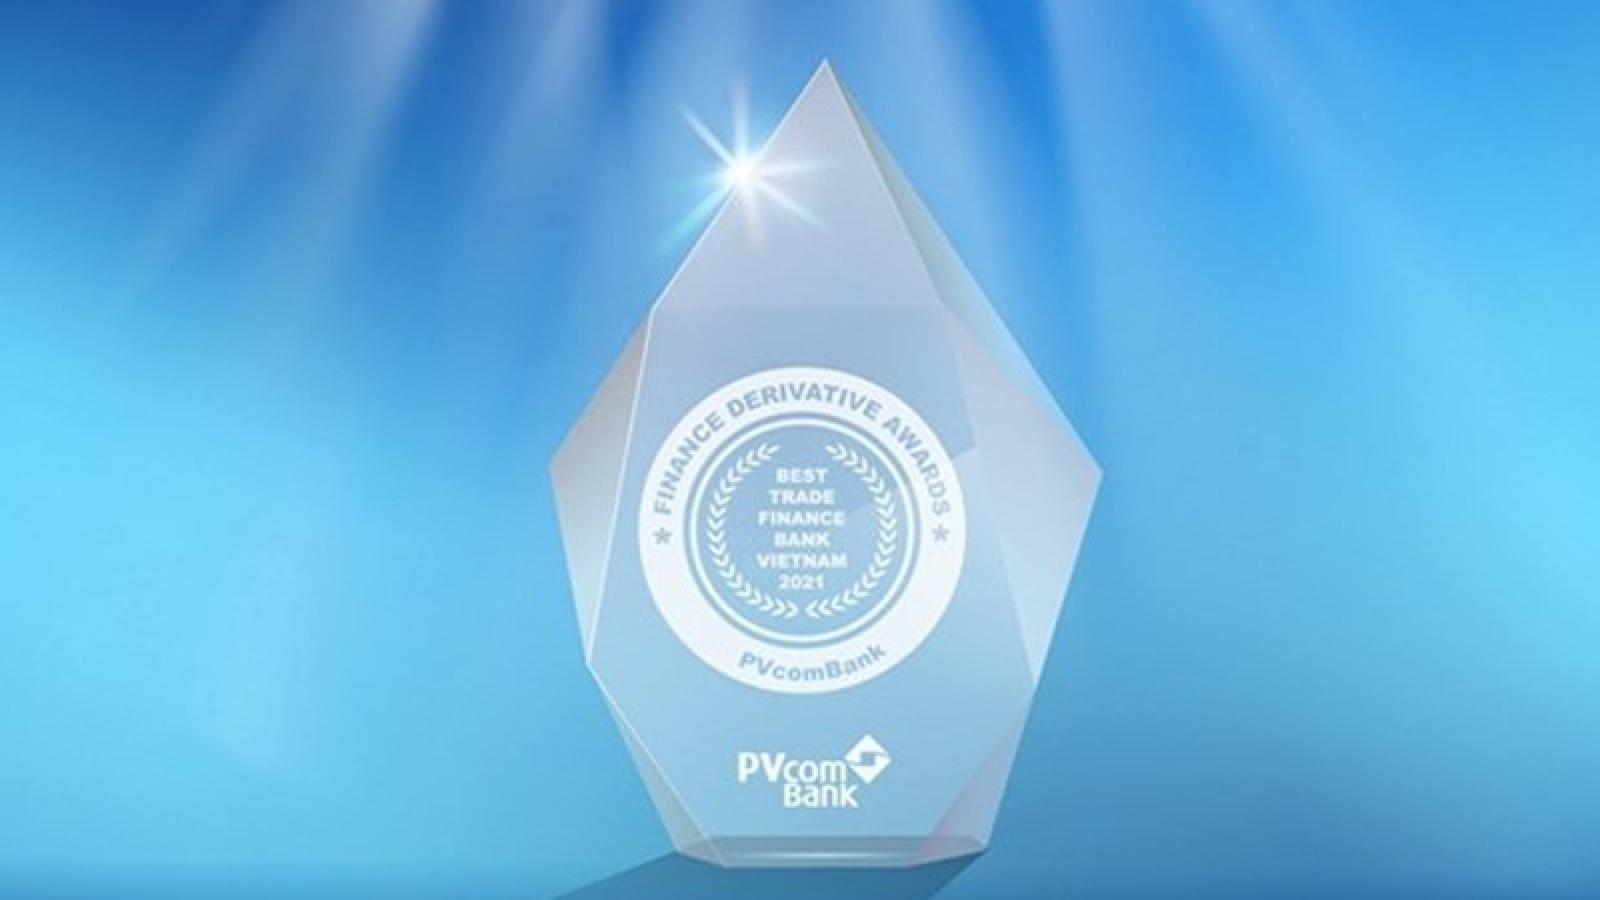 PVcomBank wins prestigious international awards